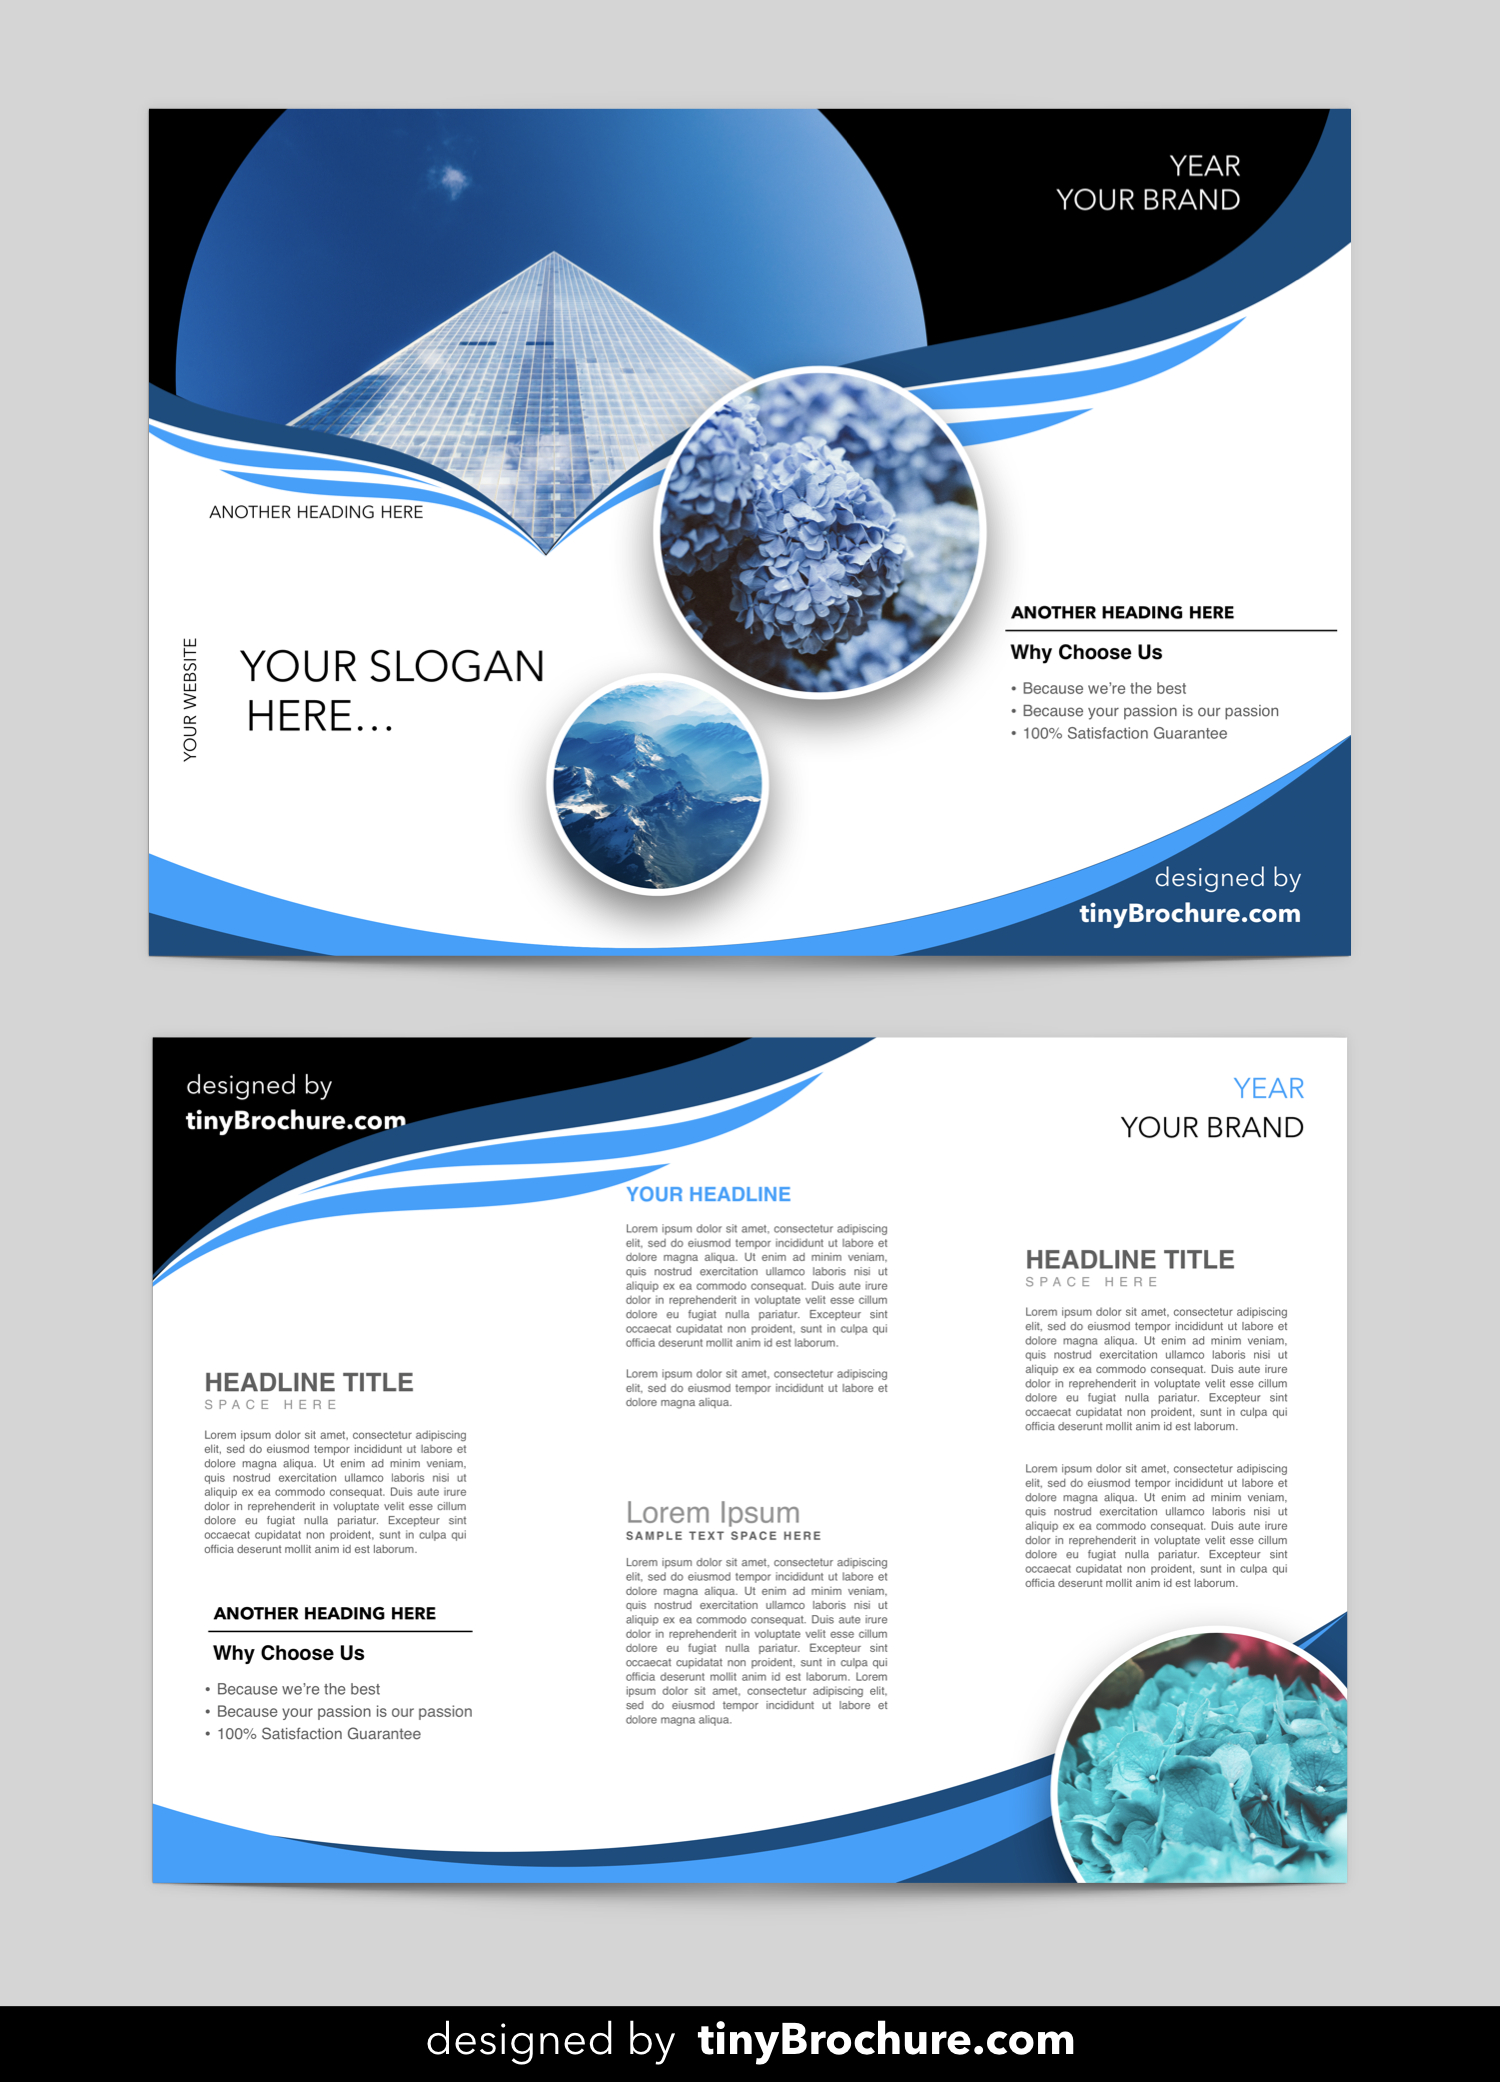 Editable Brochure Template Word Free Download | Brochure Intended For Microsoft Word Brochure Template Free